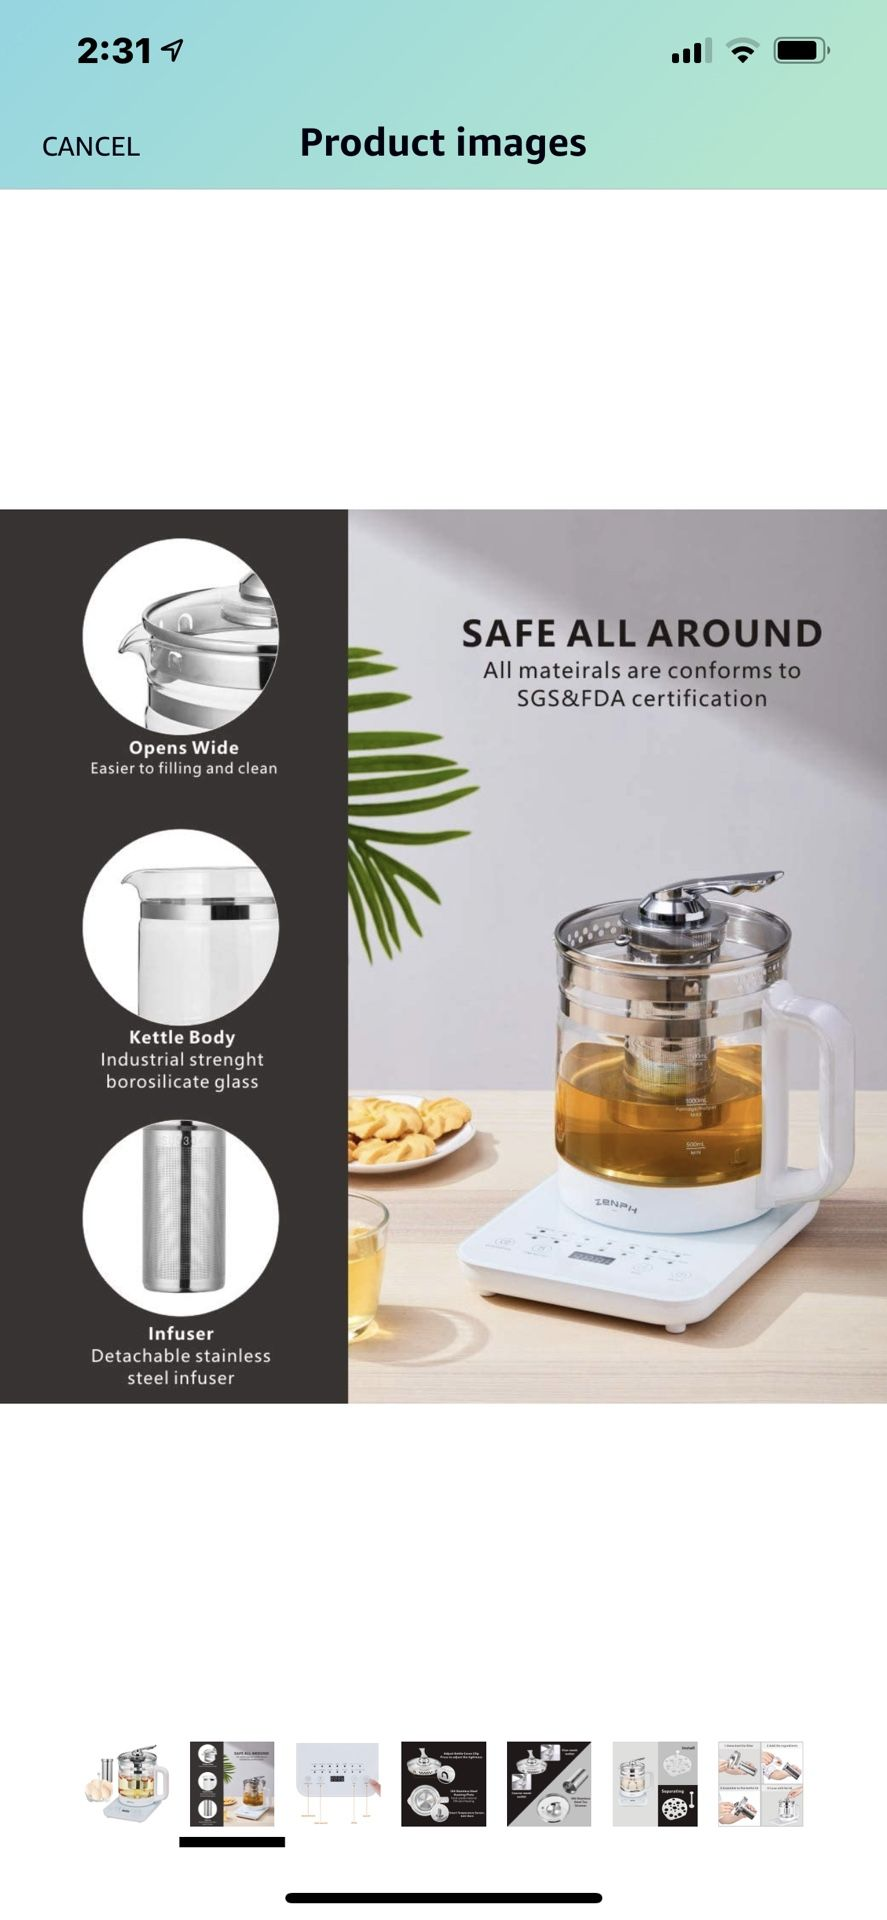 Electric Kettle, Zenph 1.5L Glass Stainless Steel Tea Kettle, Multifunction Tea Coffee Maker, Smart Touch Panel, 18 Smart Menu Hot Water Boiler with T